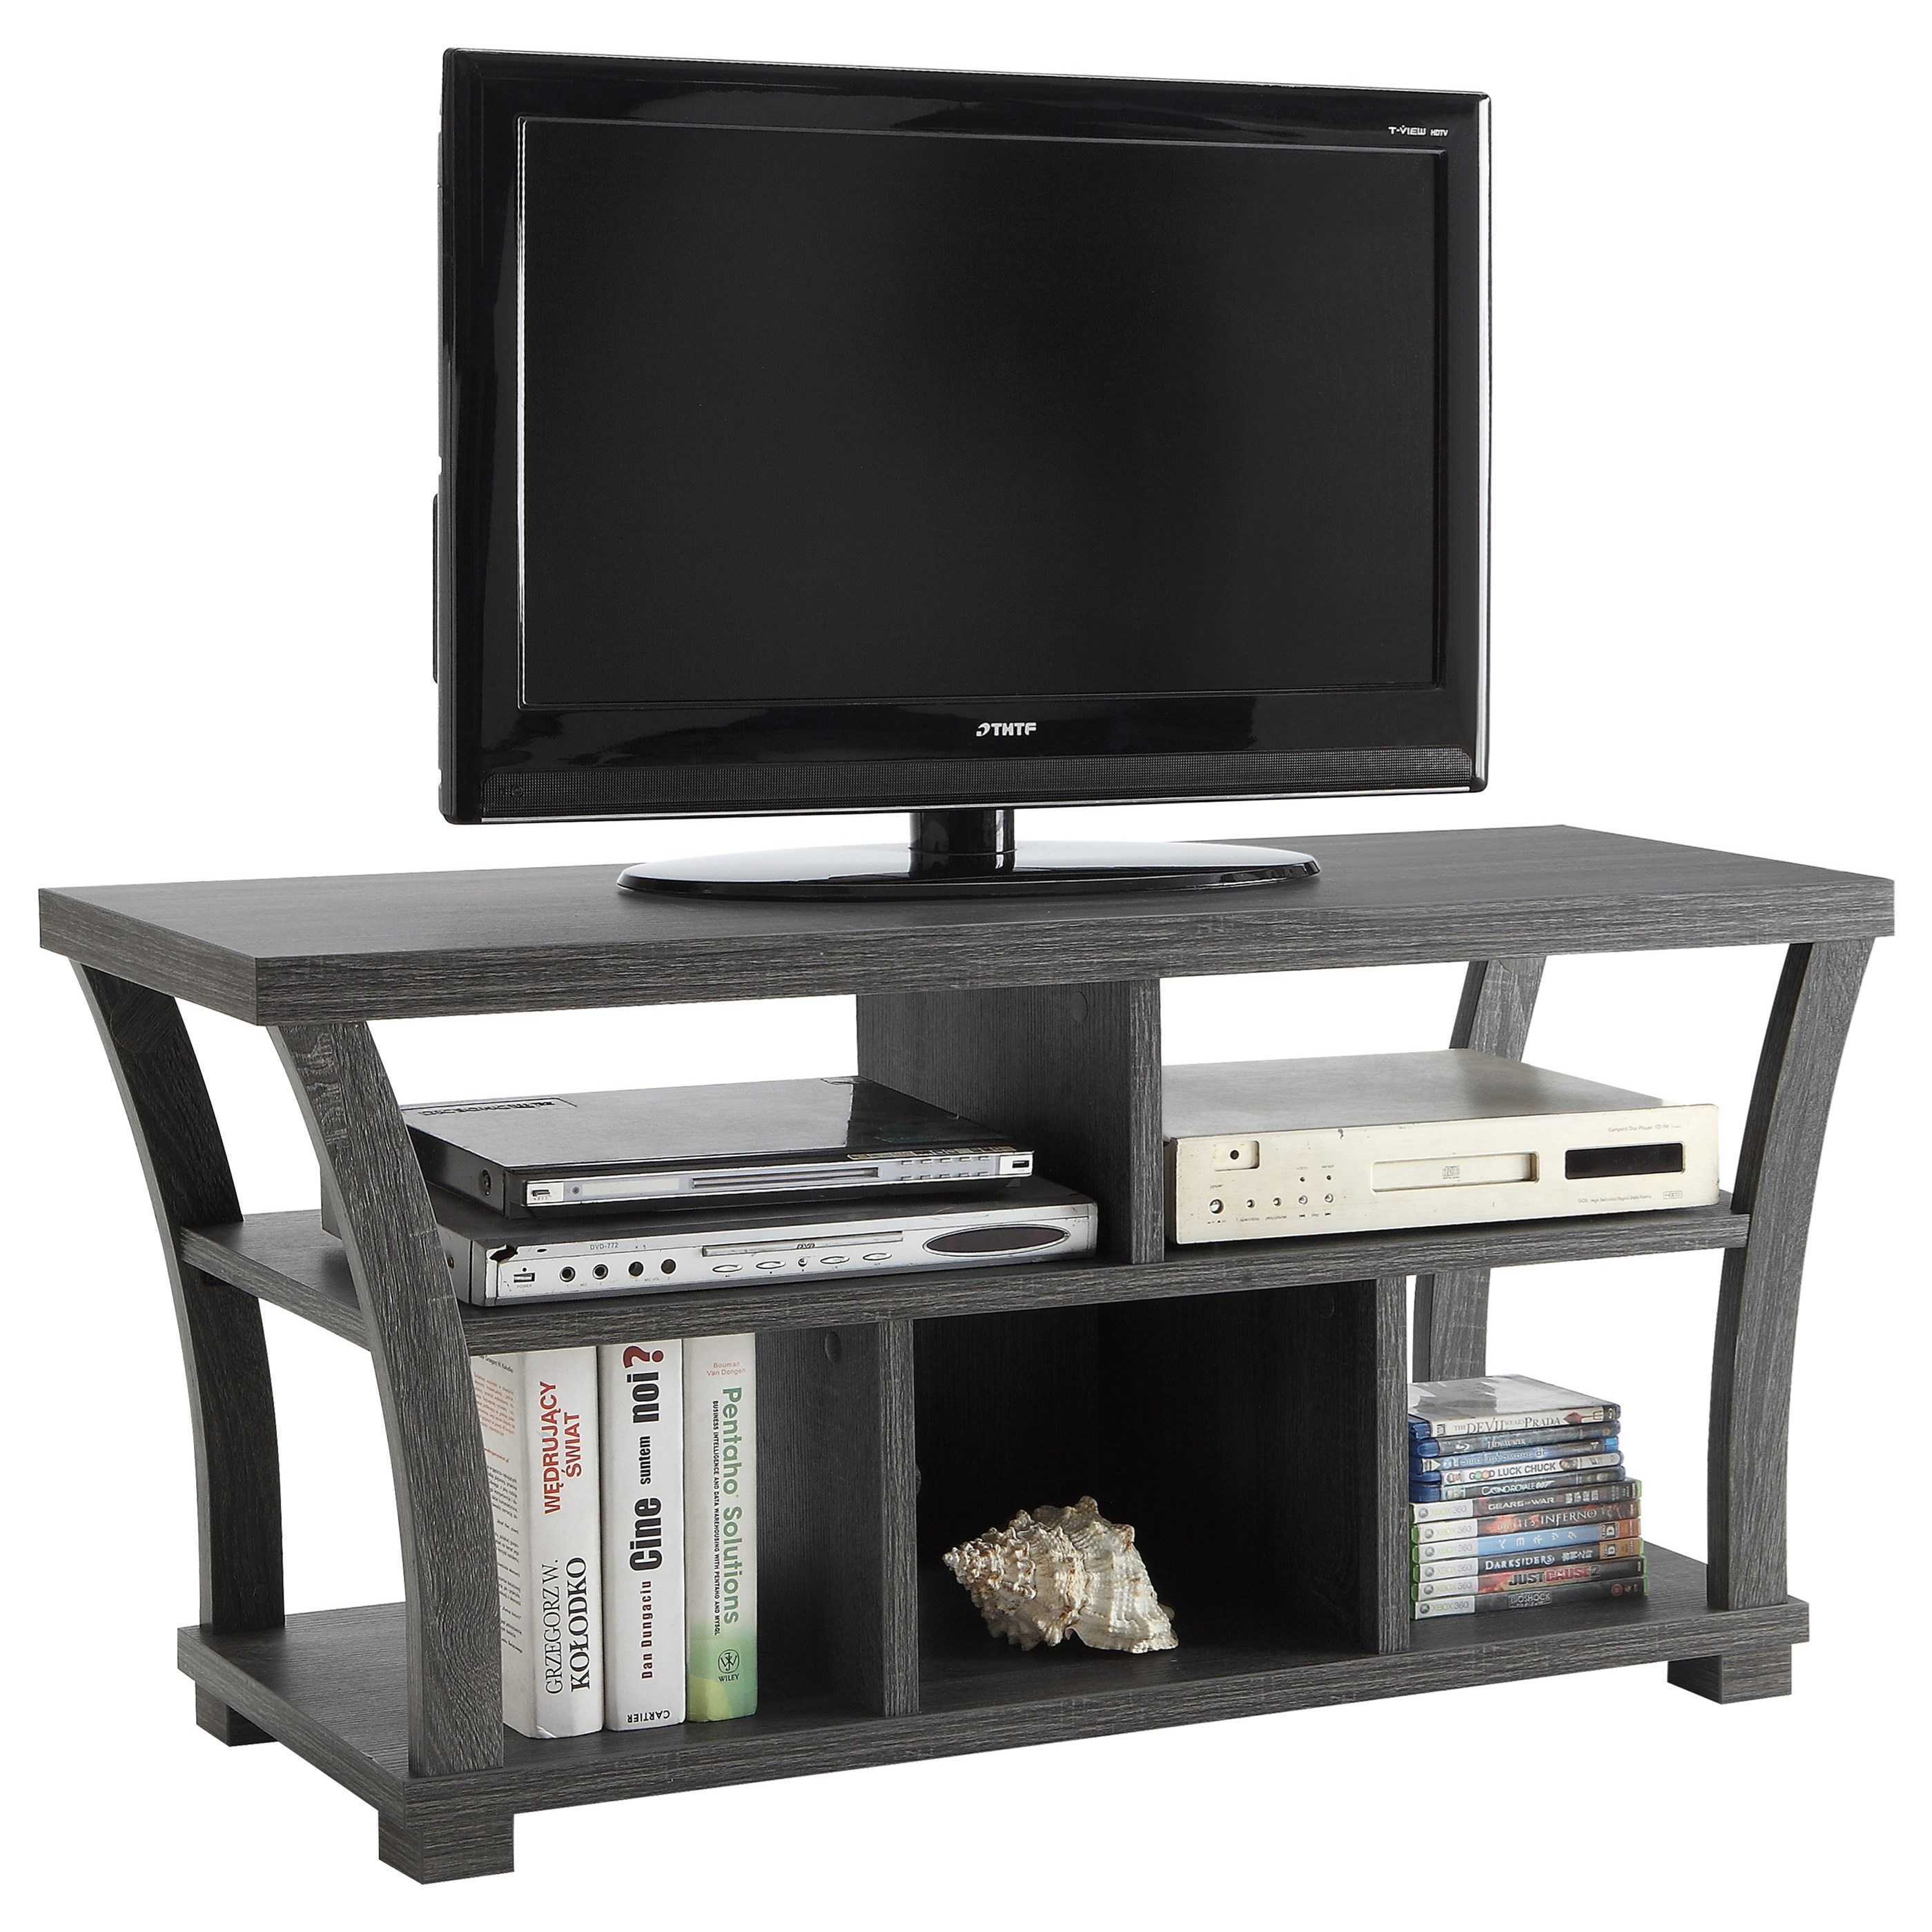 Crown Mark Draper 4806 GY Sleek Modern TV Stand Del Sol